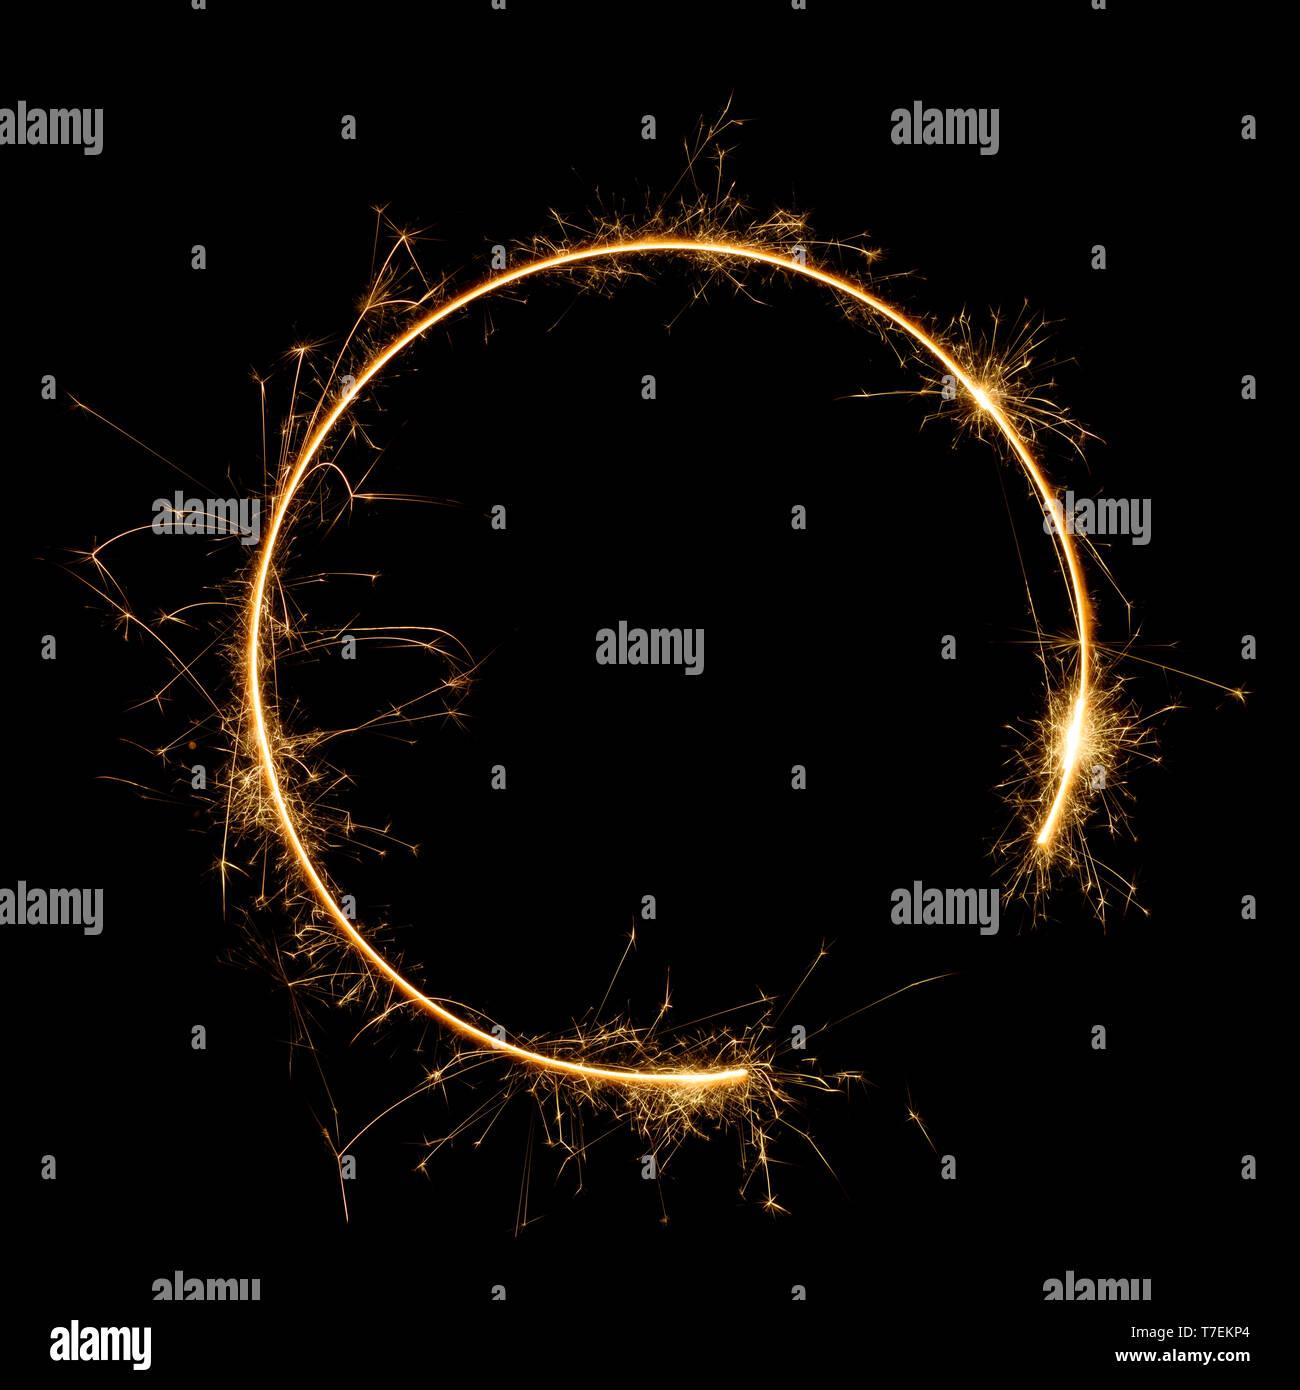 Burning bengal fire sparkler round letter o number zero, long exposure. Burning sparklers isolated on black. - Stock Image